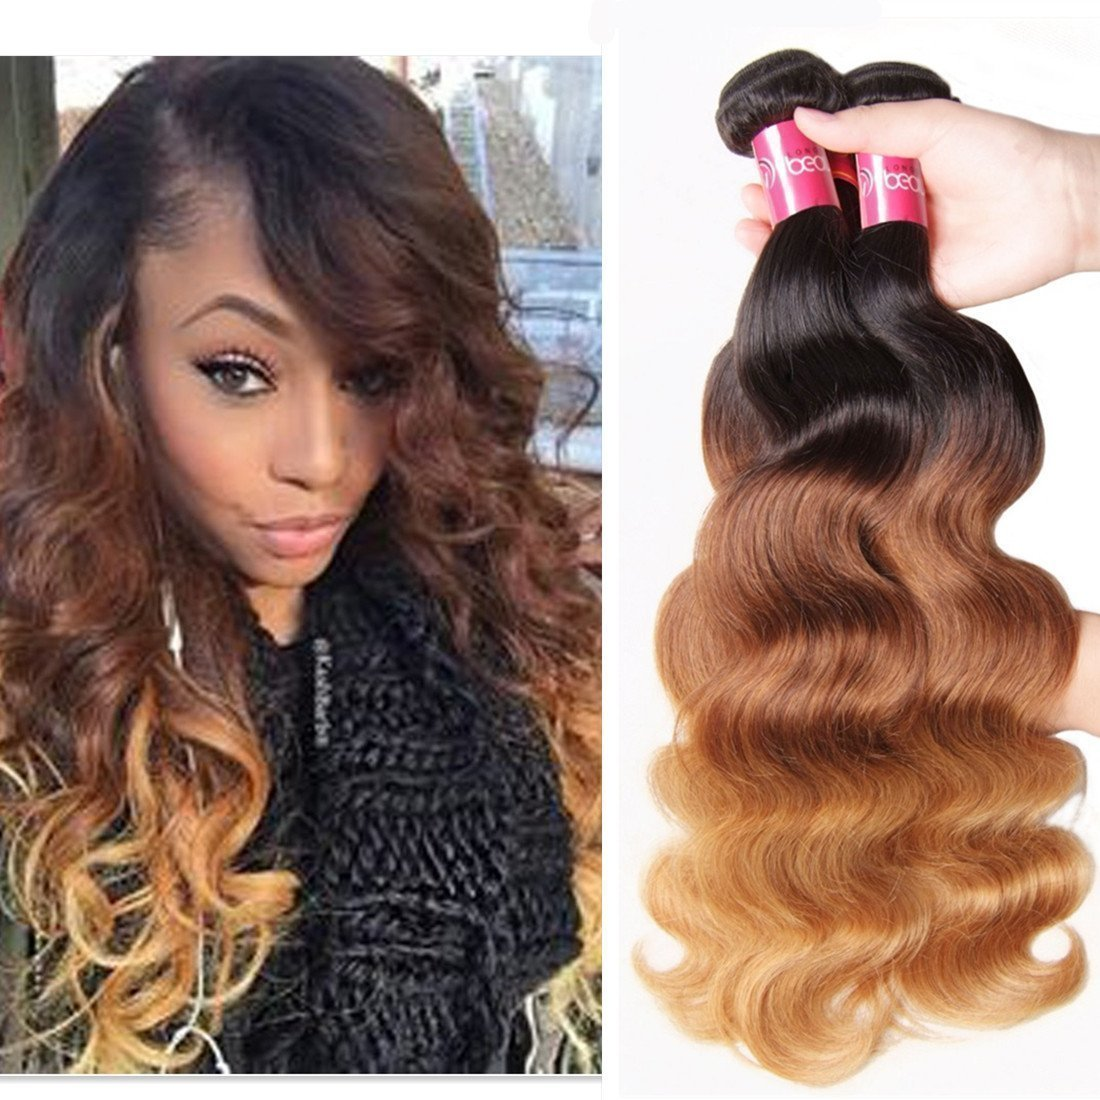 Sunber Hair Brazilian Ombre Virgin Hair Body Wave Weft Mixed Bundles 100% Human Hair Extensions #1b/4/27 Color (T1B/4/27,16 18 20)